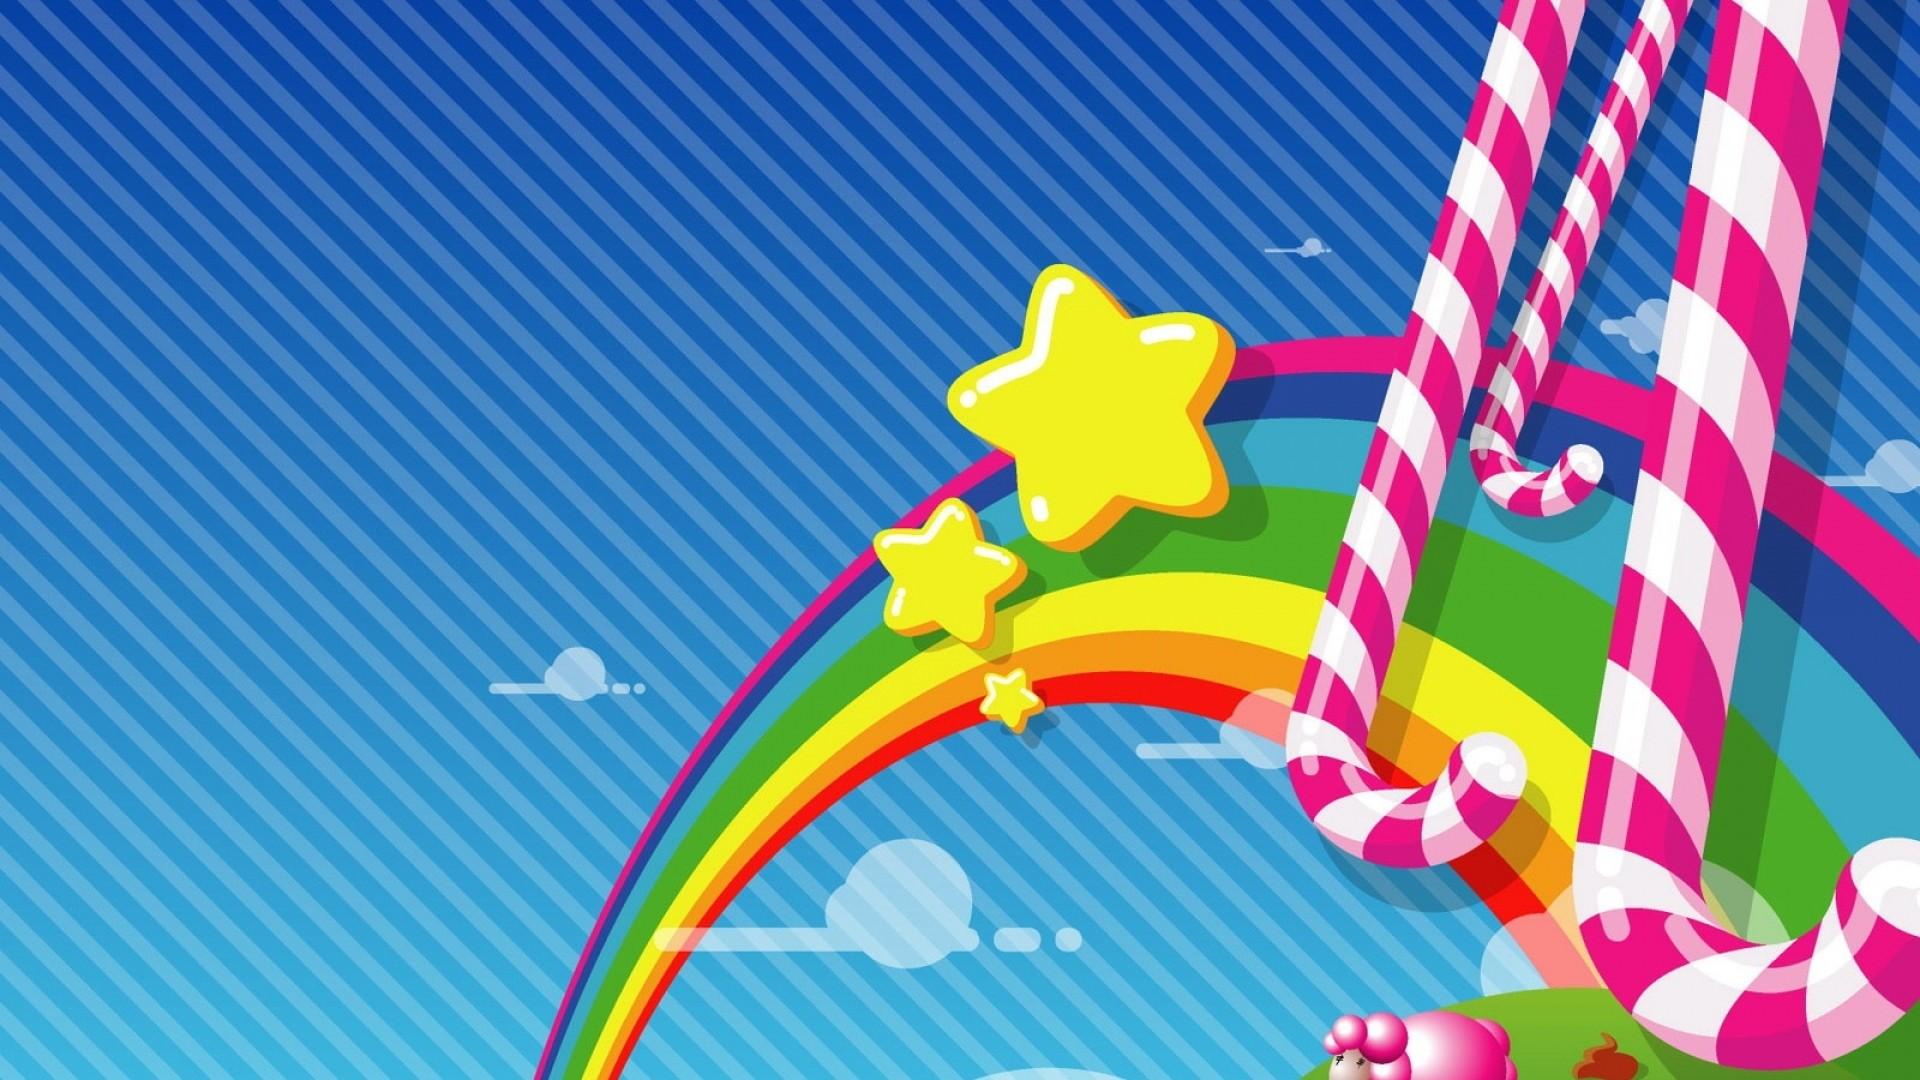 Wallpaper rainbow, candy, stars, sky